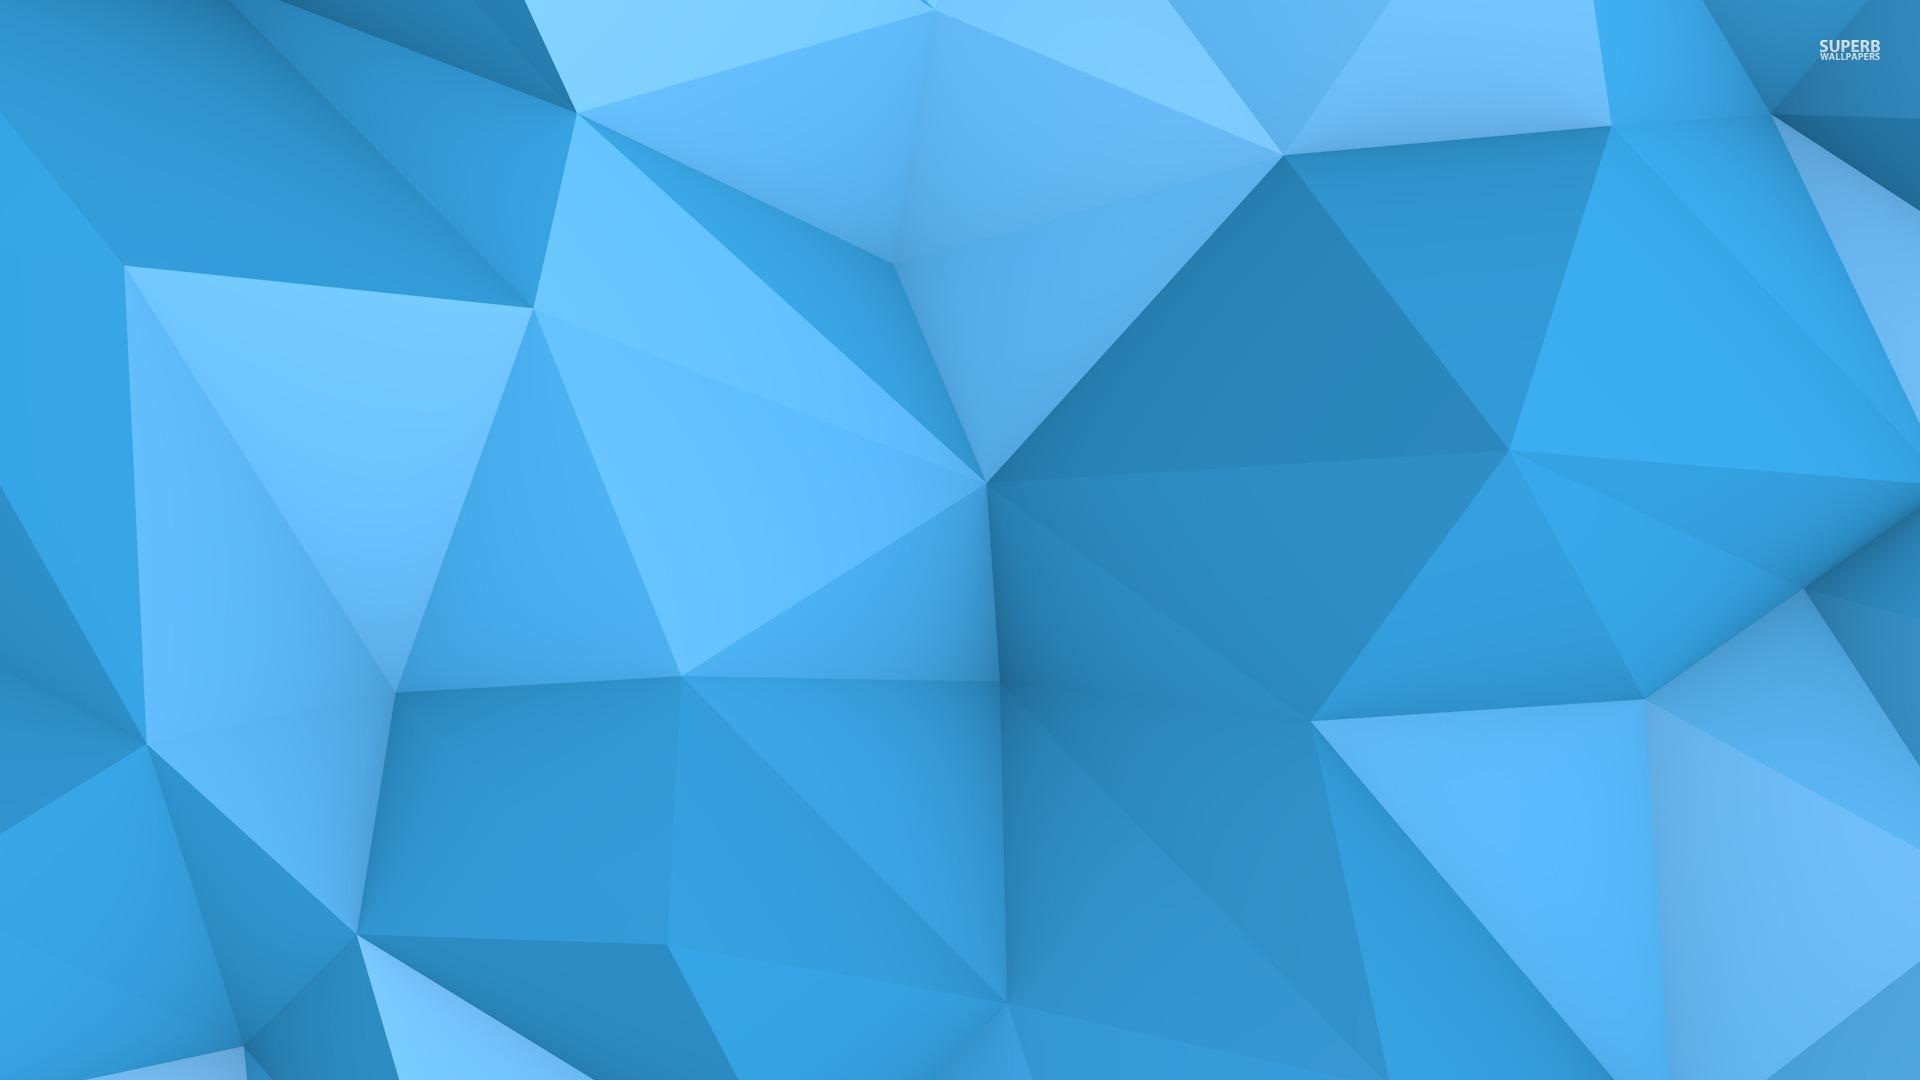 Blue polygon wallpaper 1920x1080 jpg